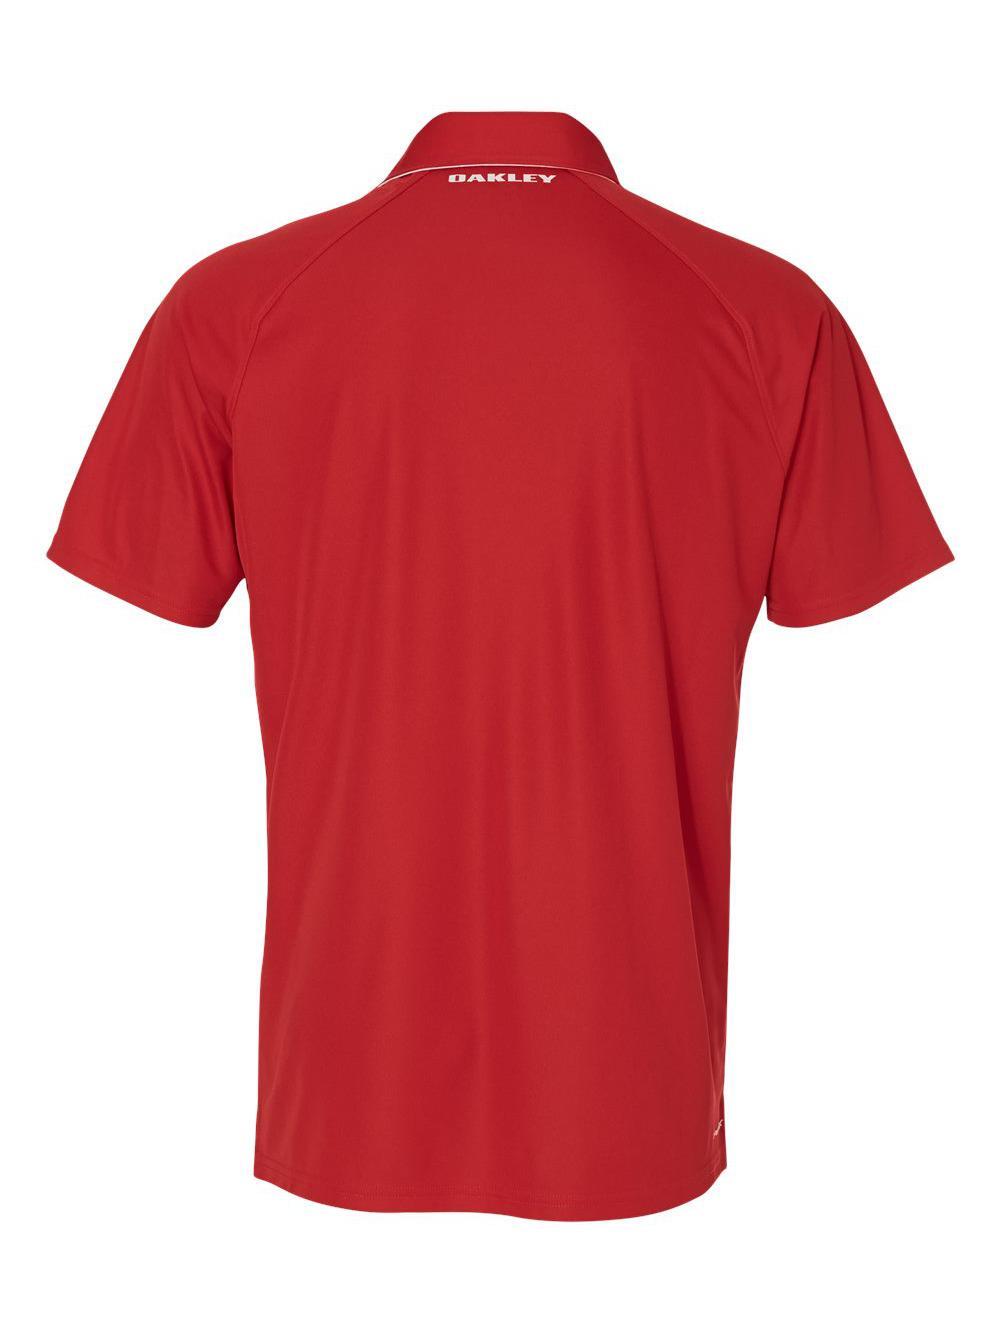 Oakley-Elemental-2-0-Sport-Shirt-432632ODM thumbnail 7